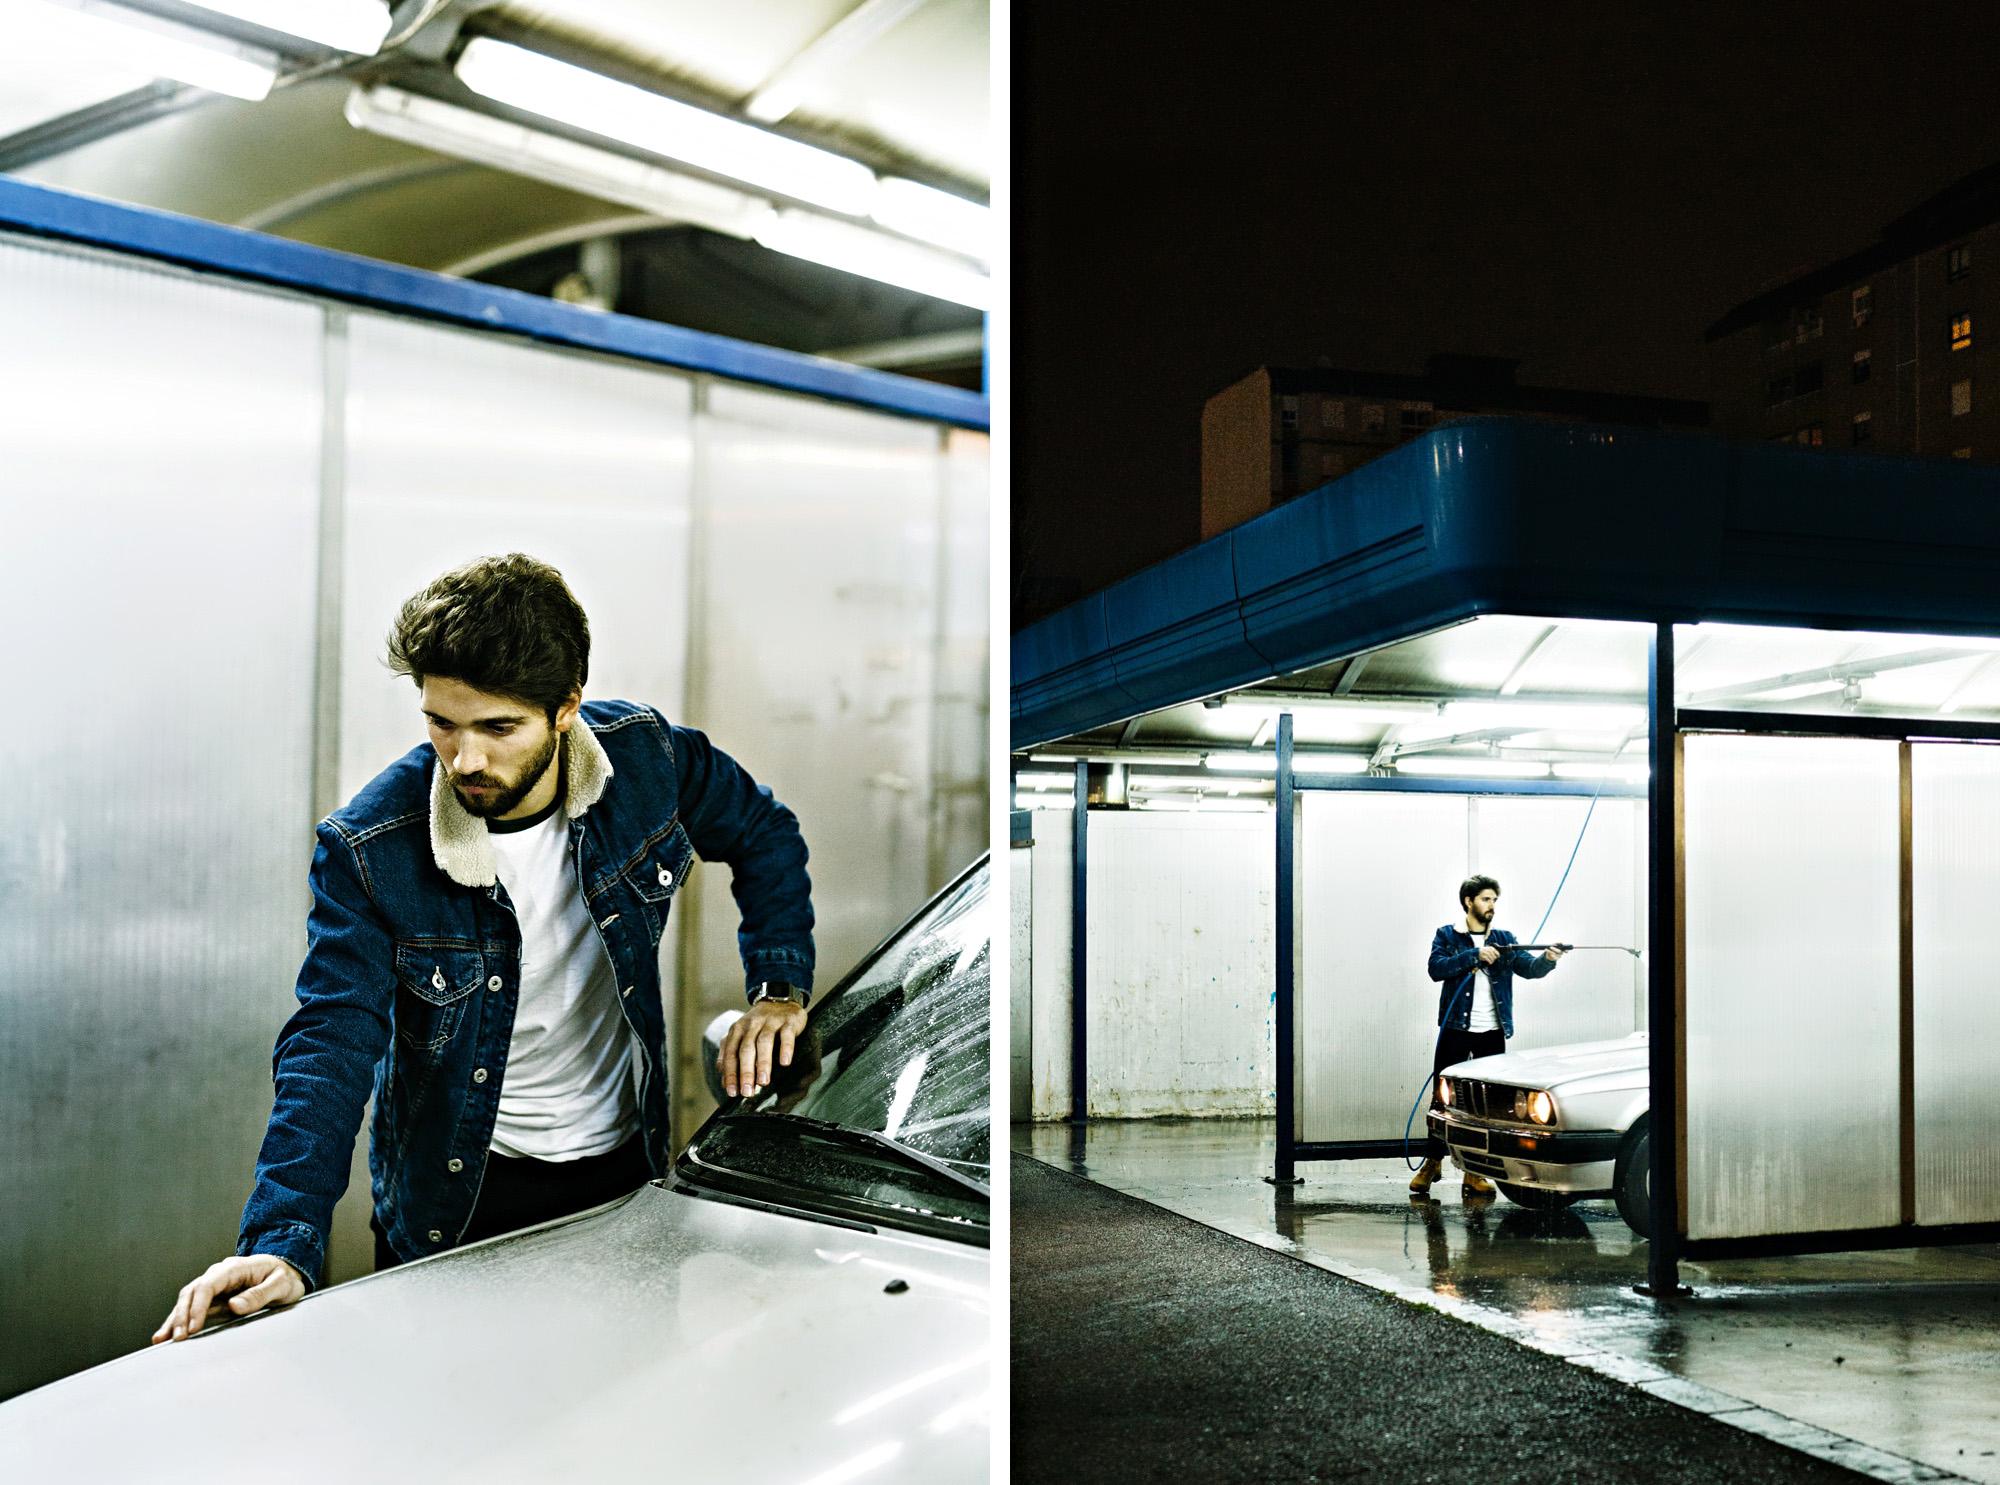 fotografo publicidad Valencia catalogo moda hombre